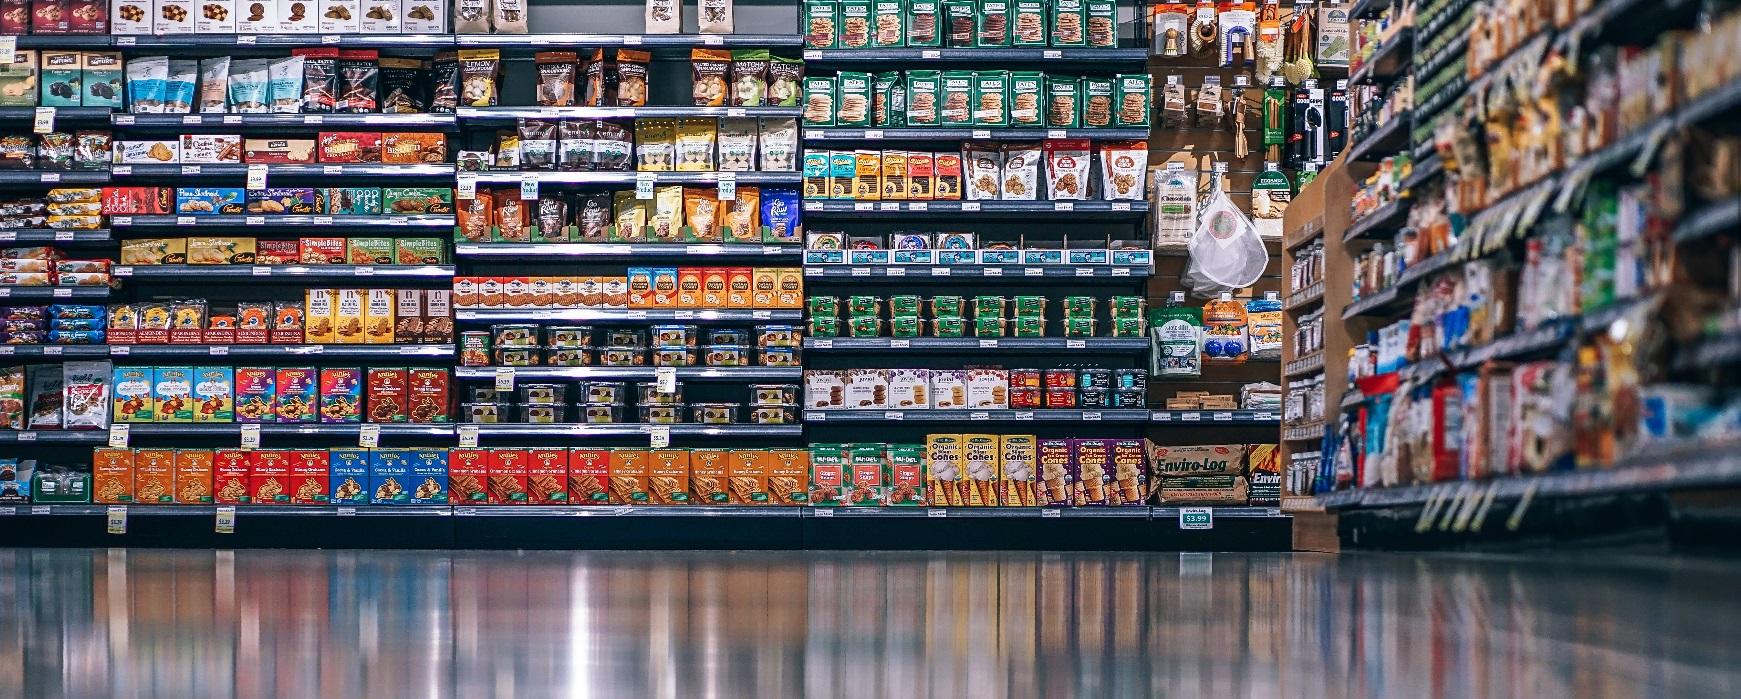 Sunshine Coast IGA Supermarket For Sale in Queensland, Australia